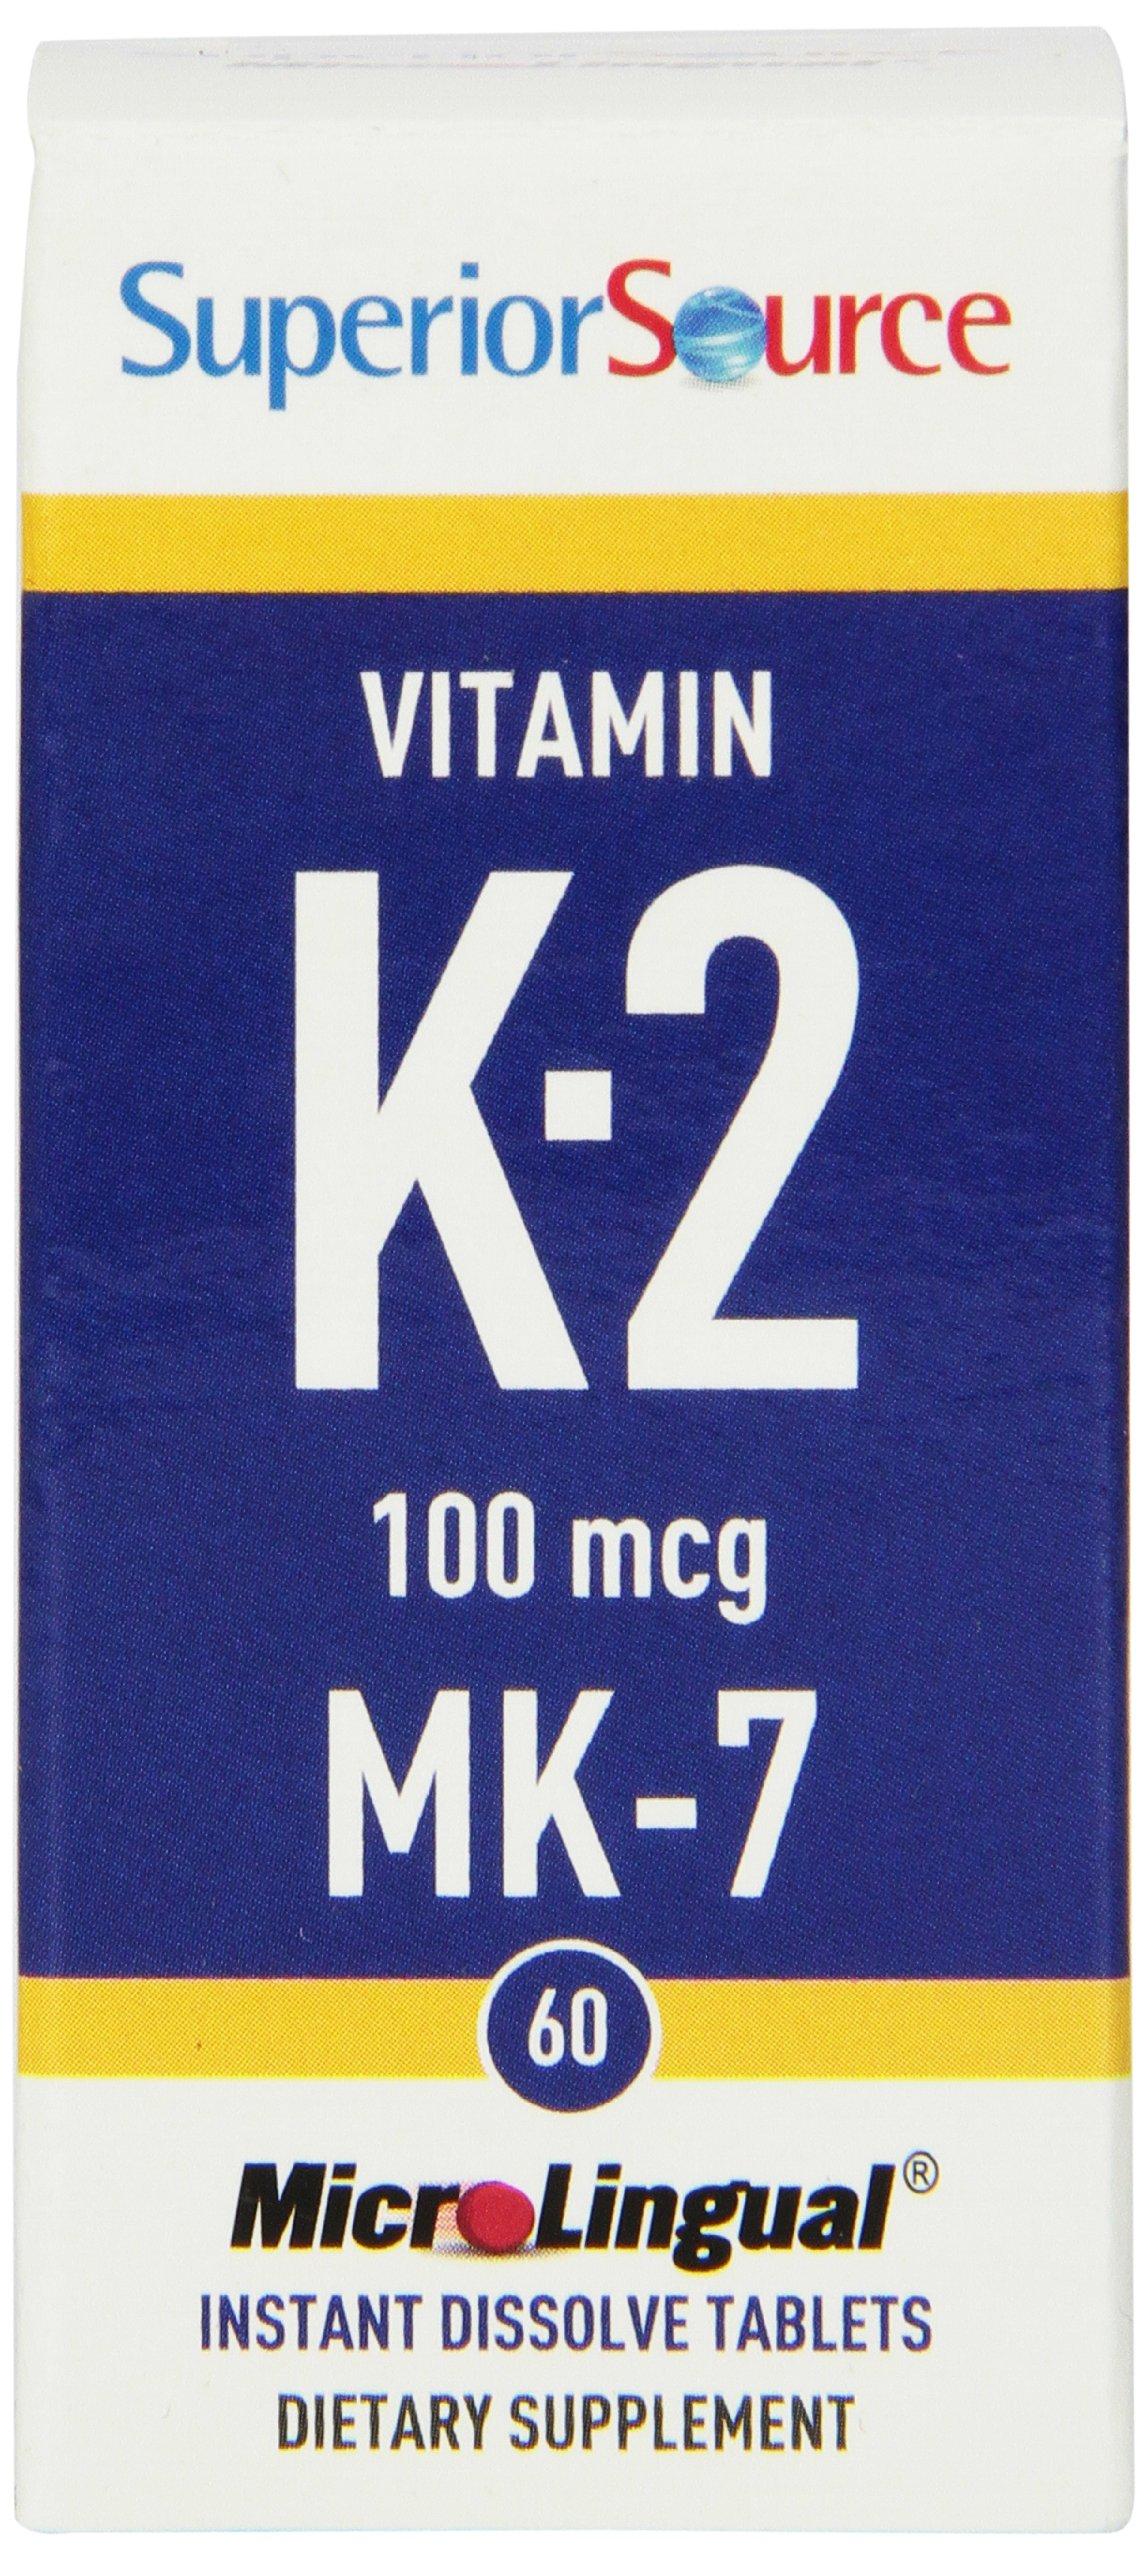 Superior Source Vitamin K2-MK7, 100 mcg, 60 Count